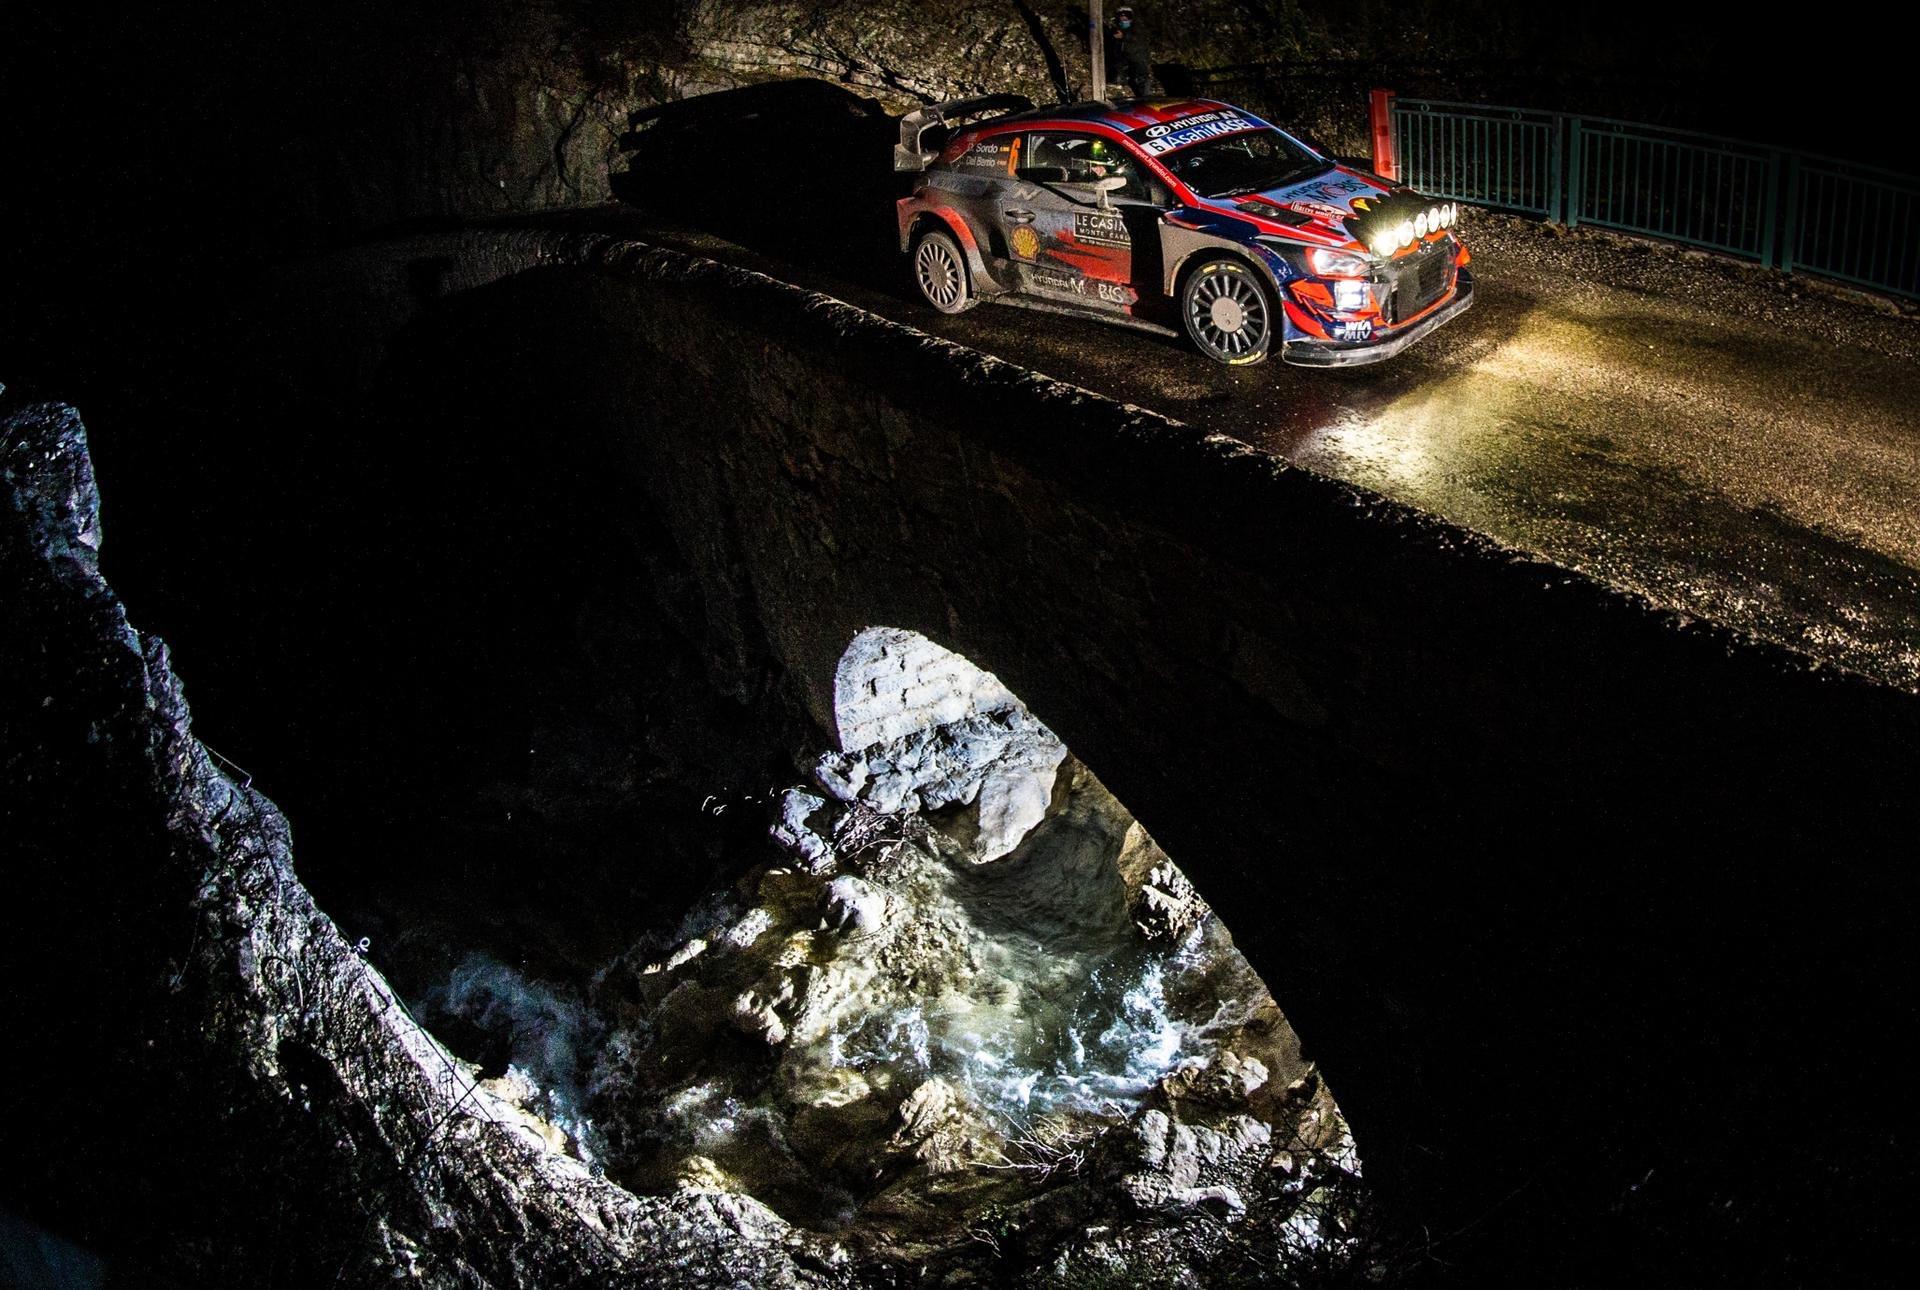 WRC: 89º Rallye Automobile de Monte-Carlo [18-24 Enero] - Página 10 EsZUJEiXAAYiHSi?format=jpg&name=large